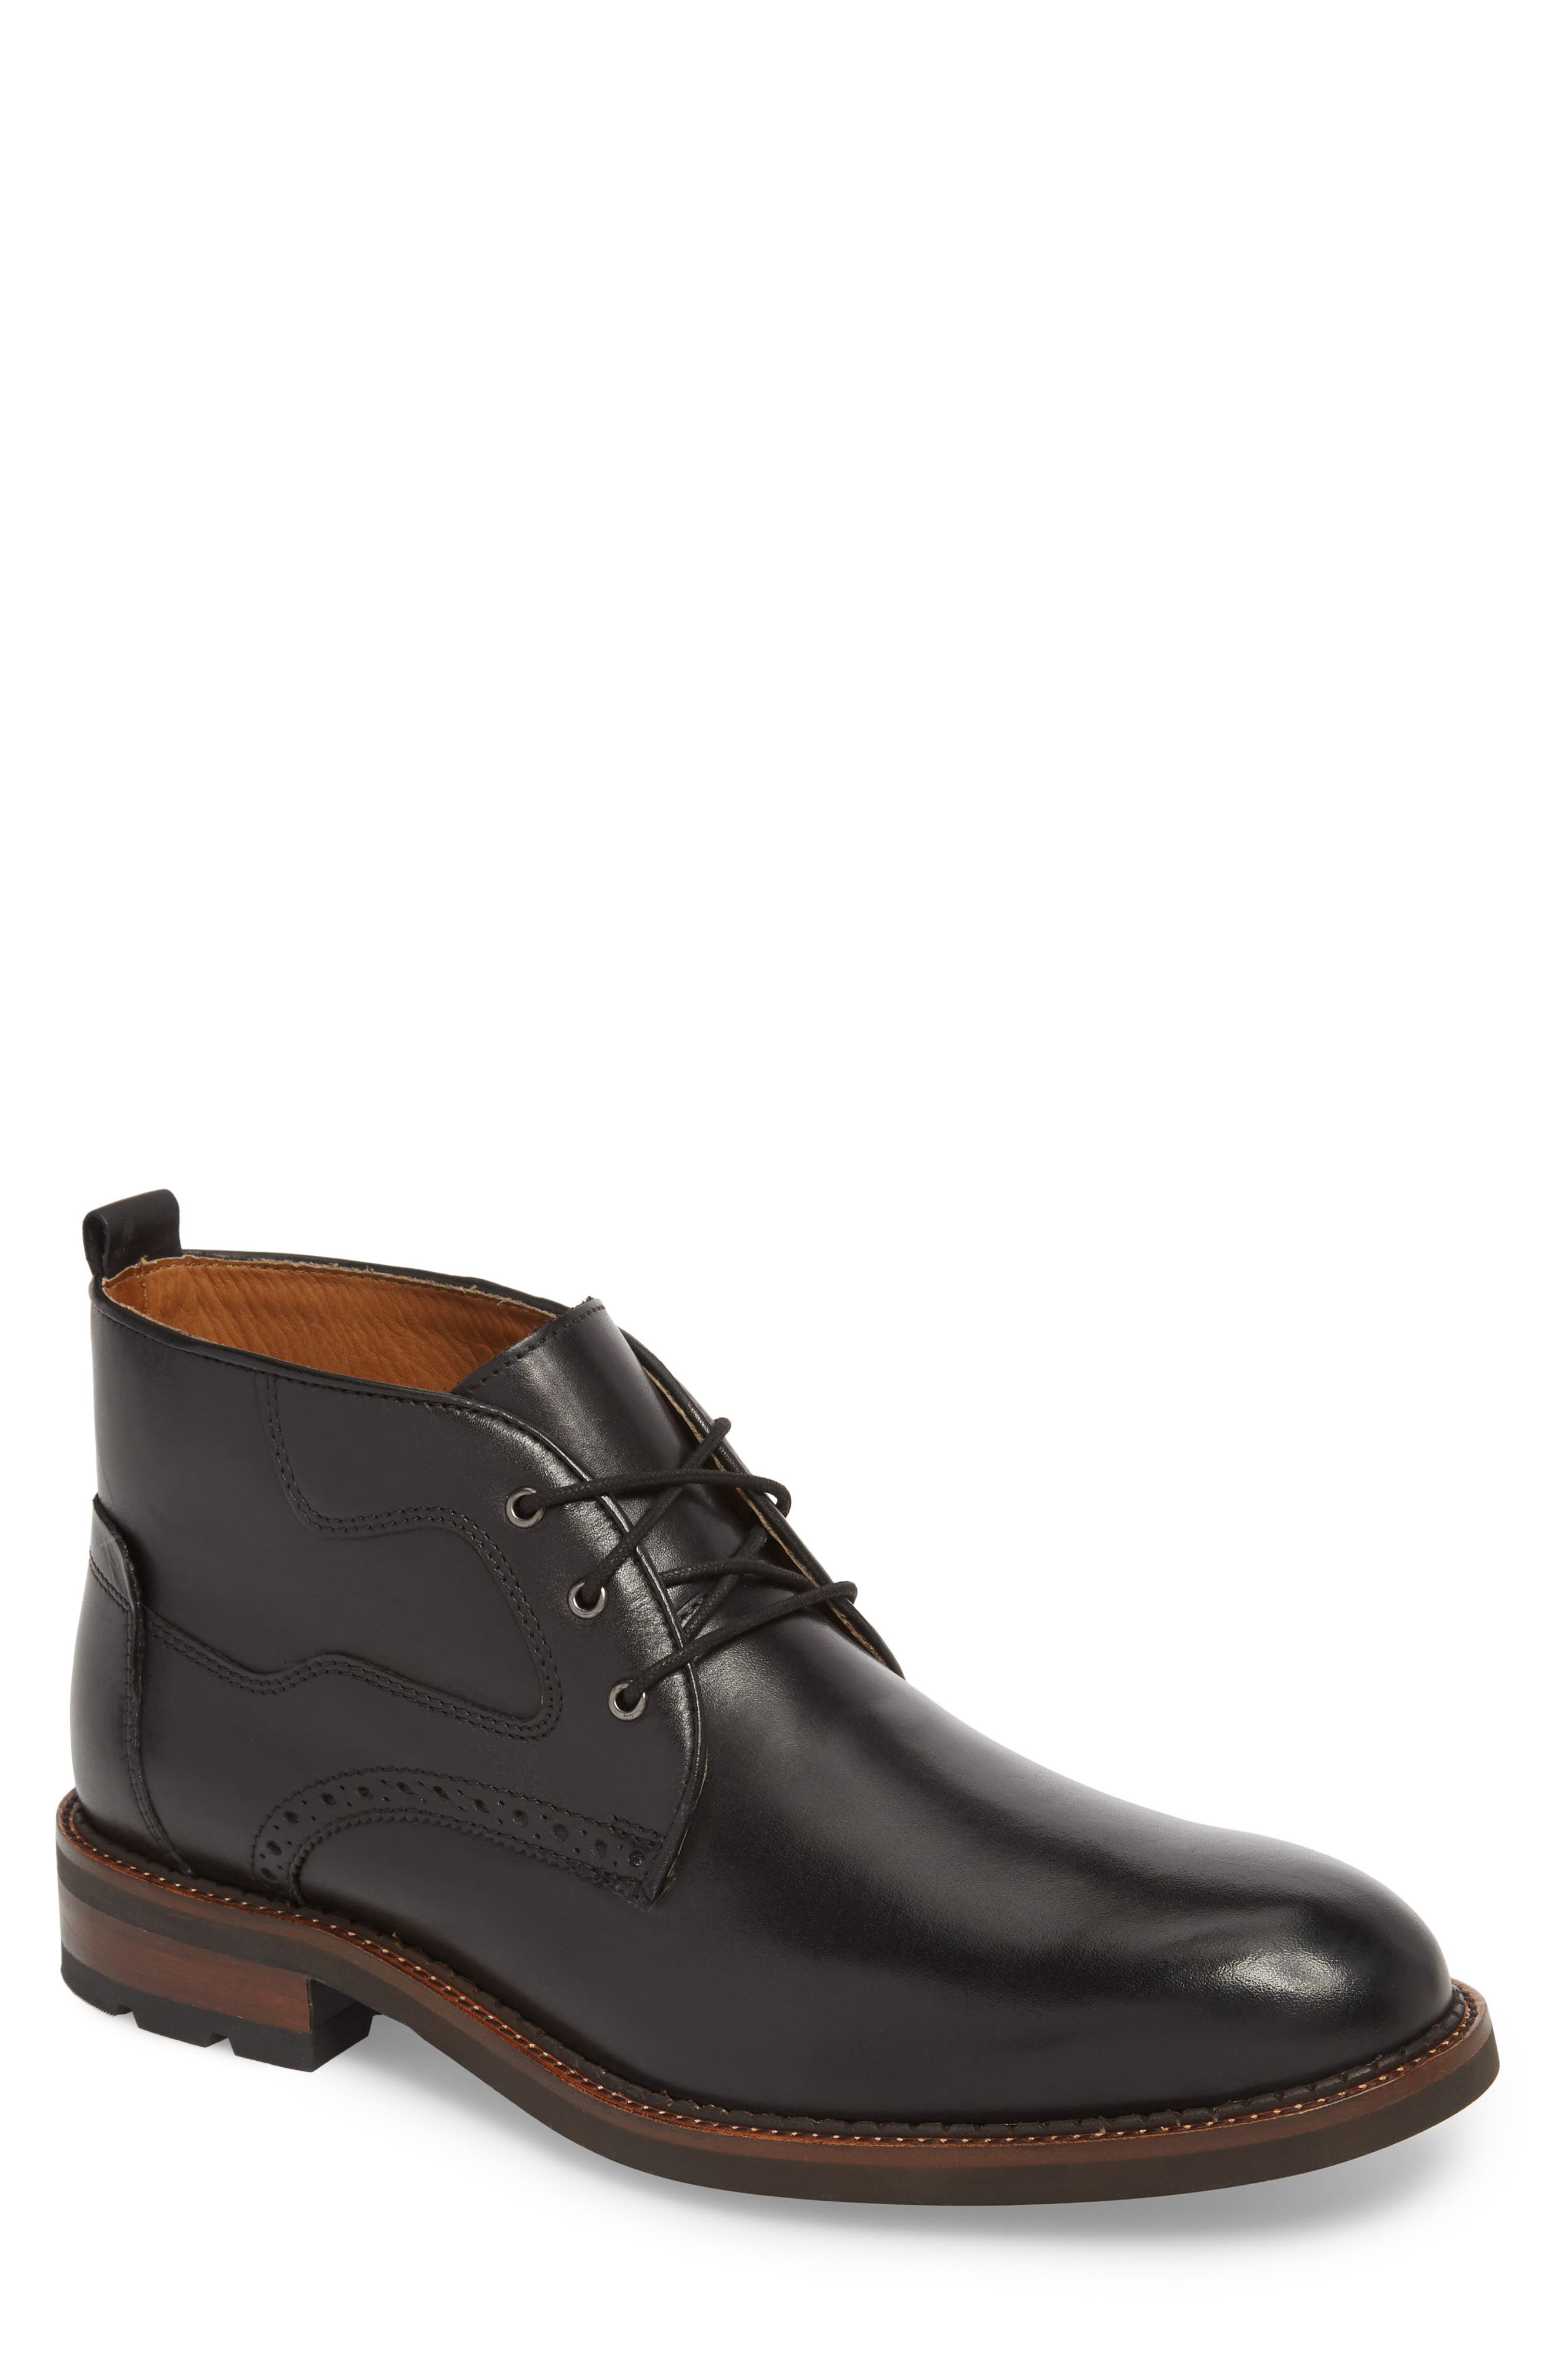 J&M 1850 Fullerton Chukka Boot, Main, color, BLACK